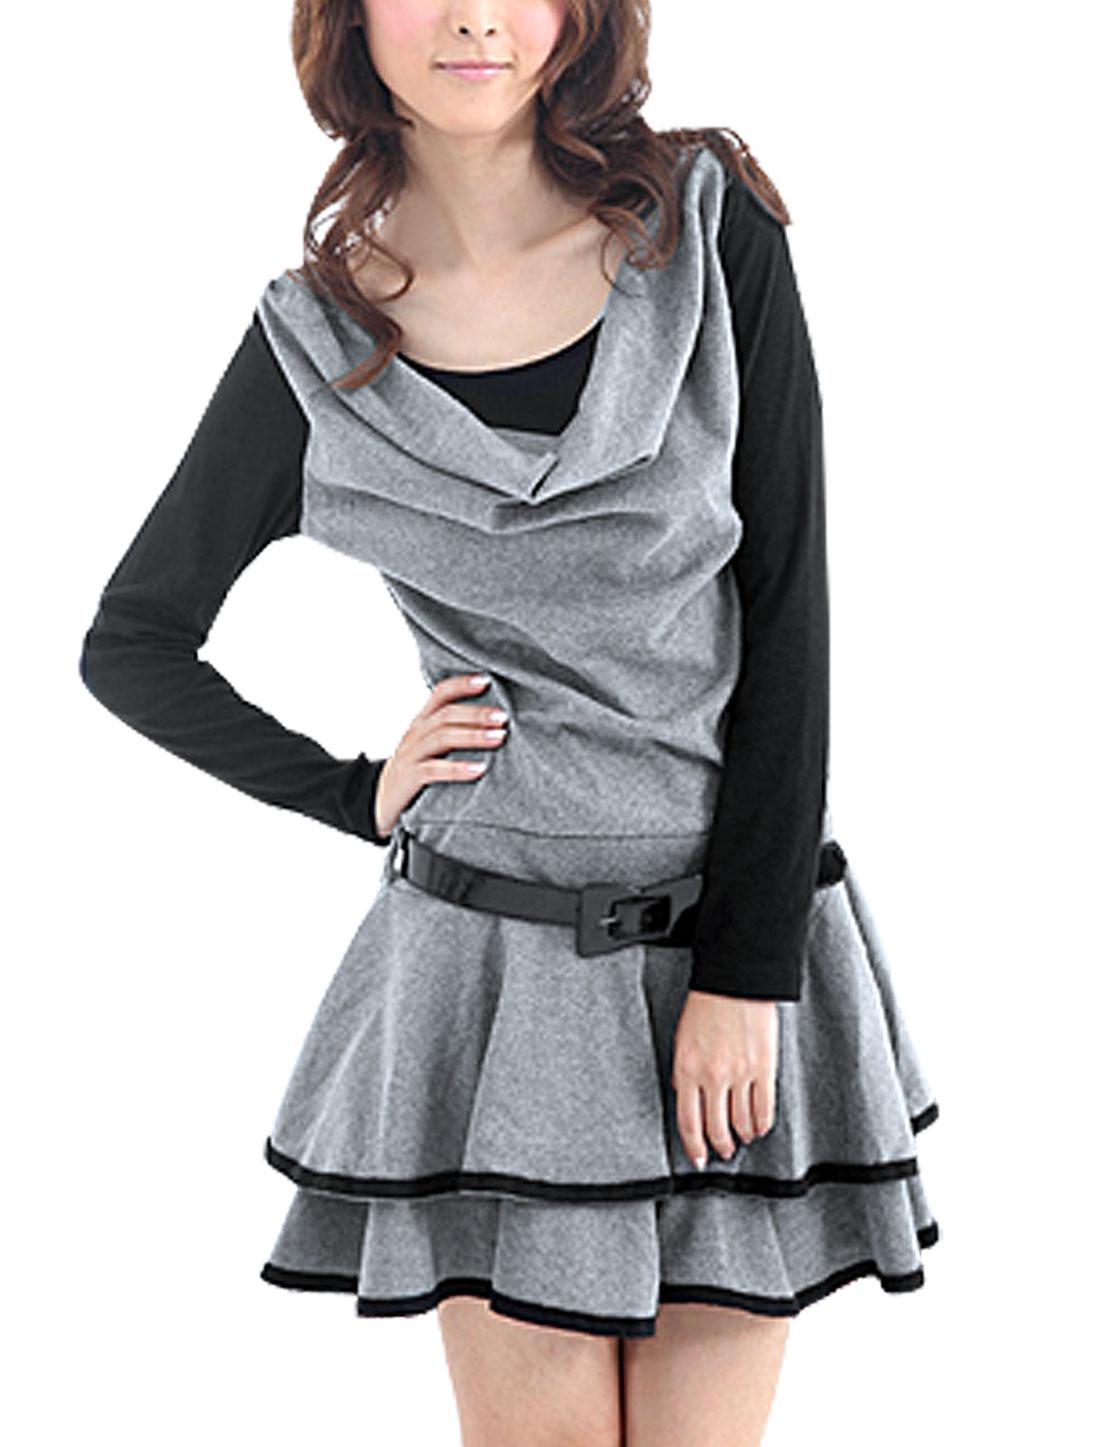 Light Gray Scoop Neck Layered Dresses Mini Dress XS for Women